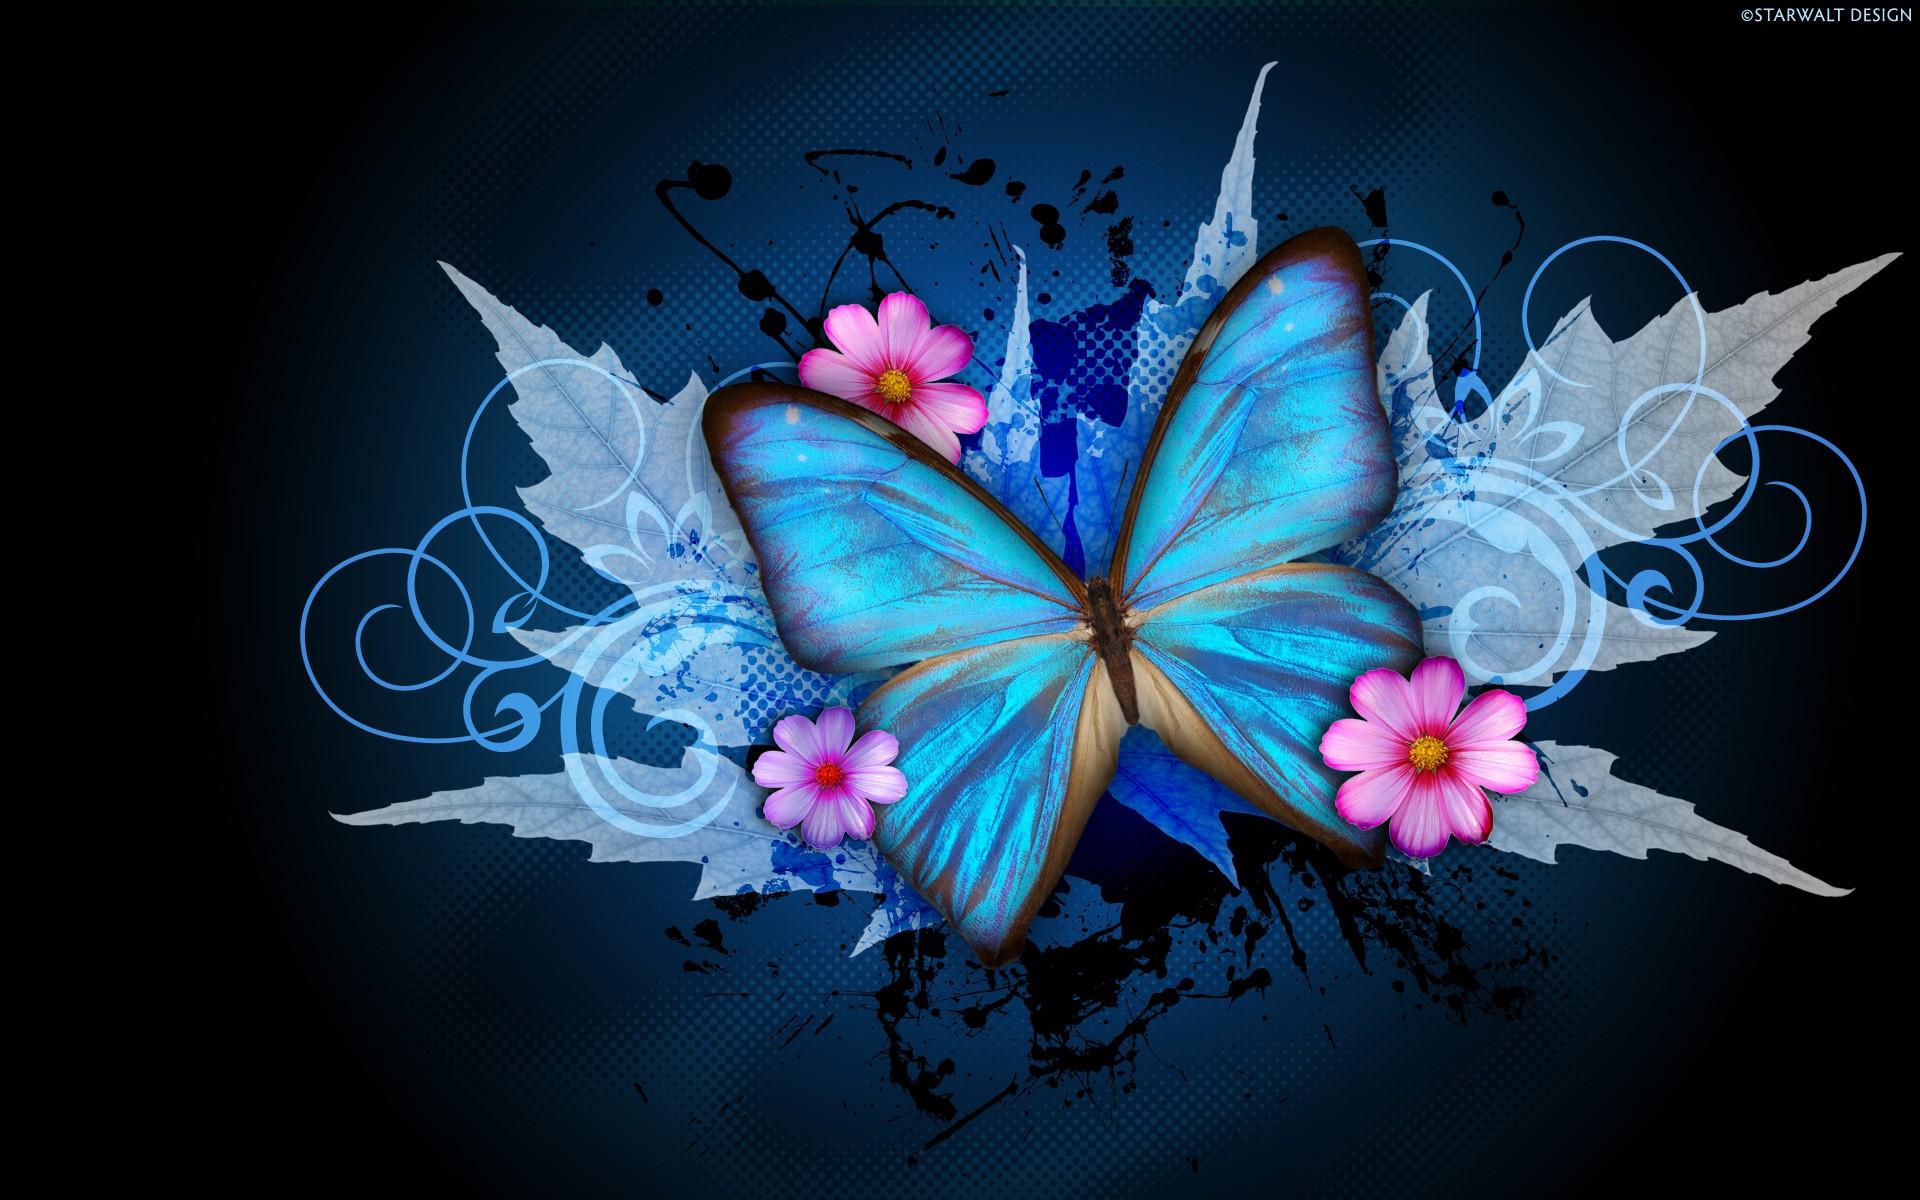 64 Abstract Butterfly Wallpaper On Wallpapersafari